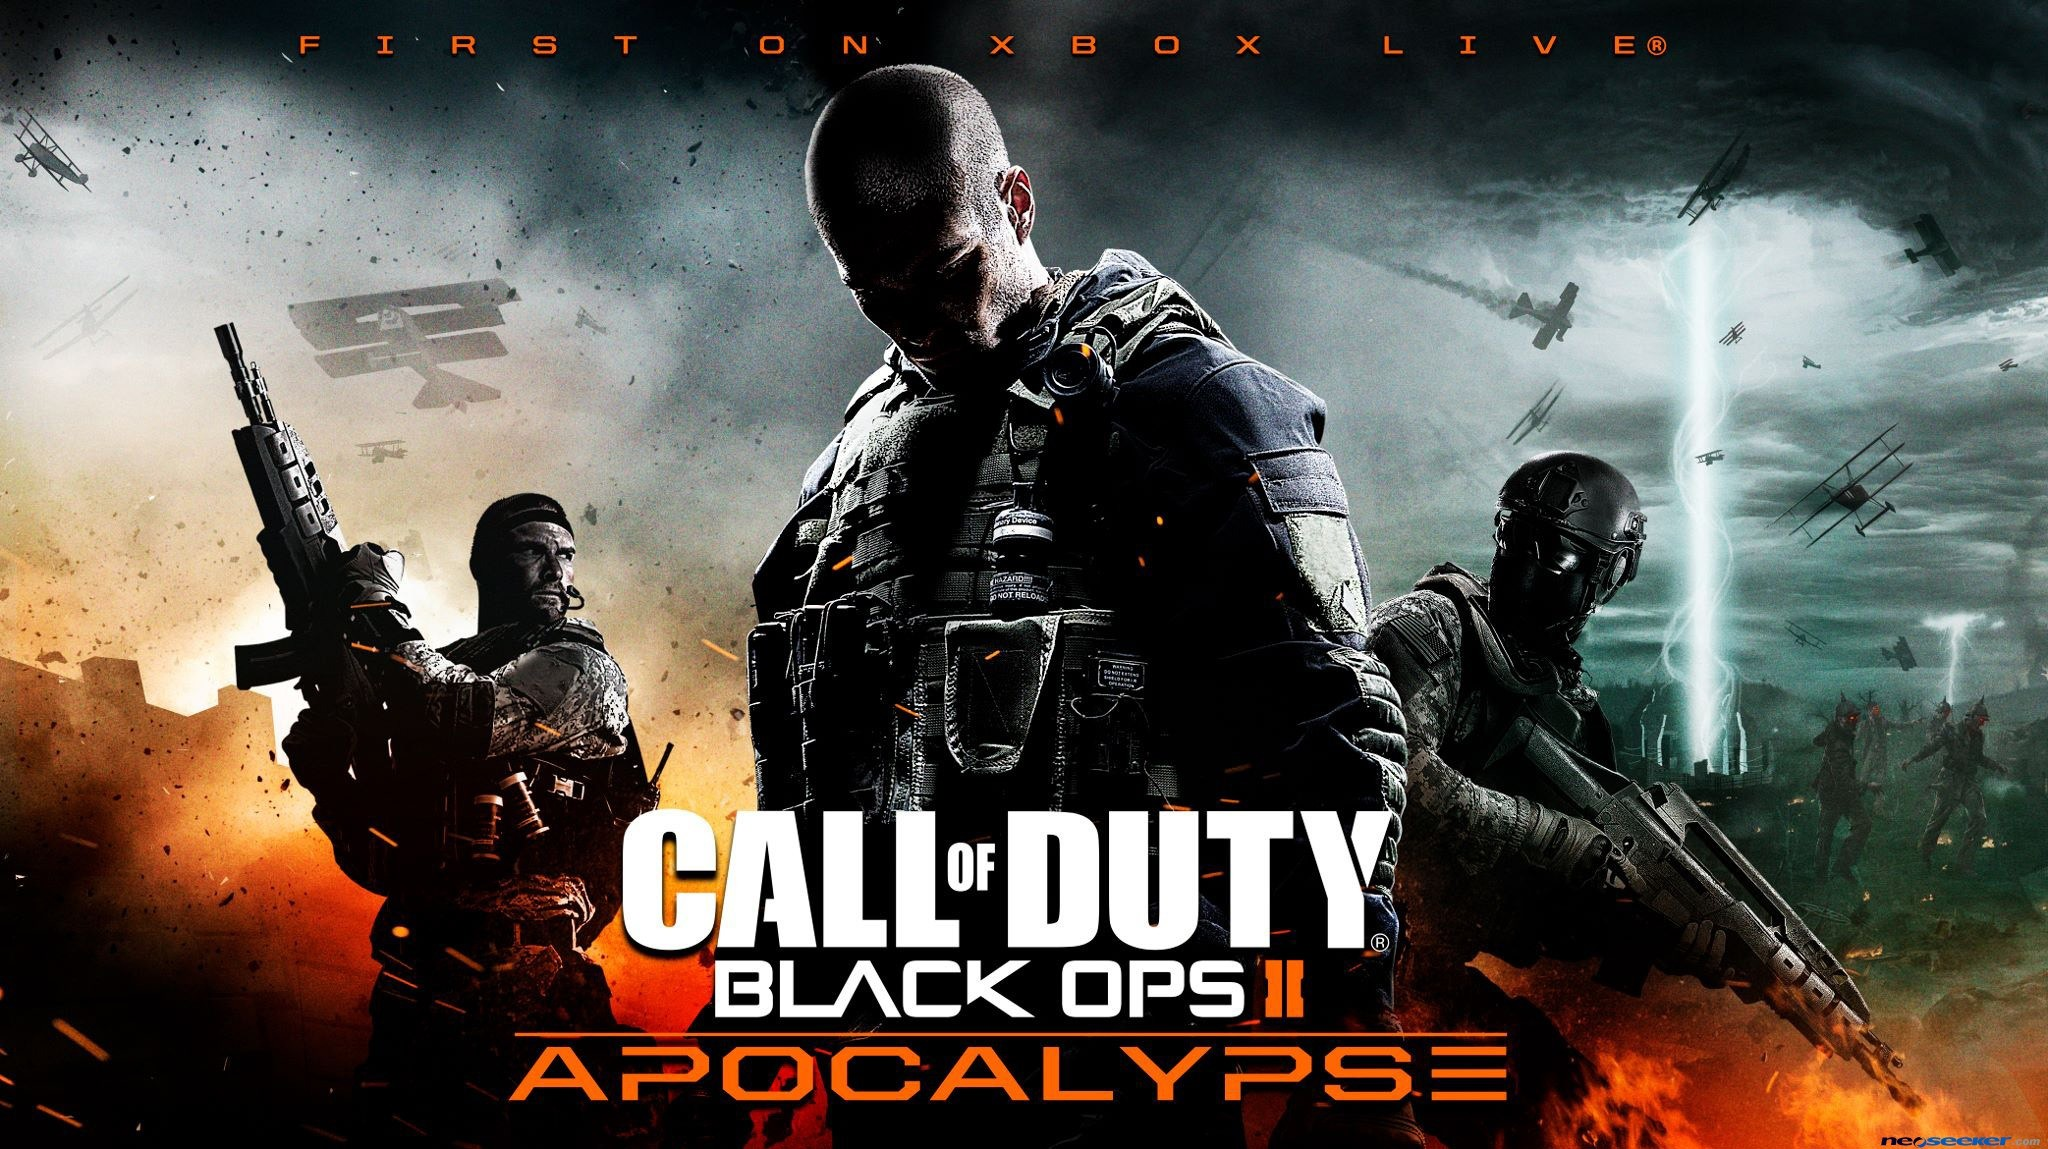 2048x1149 call of duty black ops 2 wallpaper hd